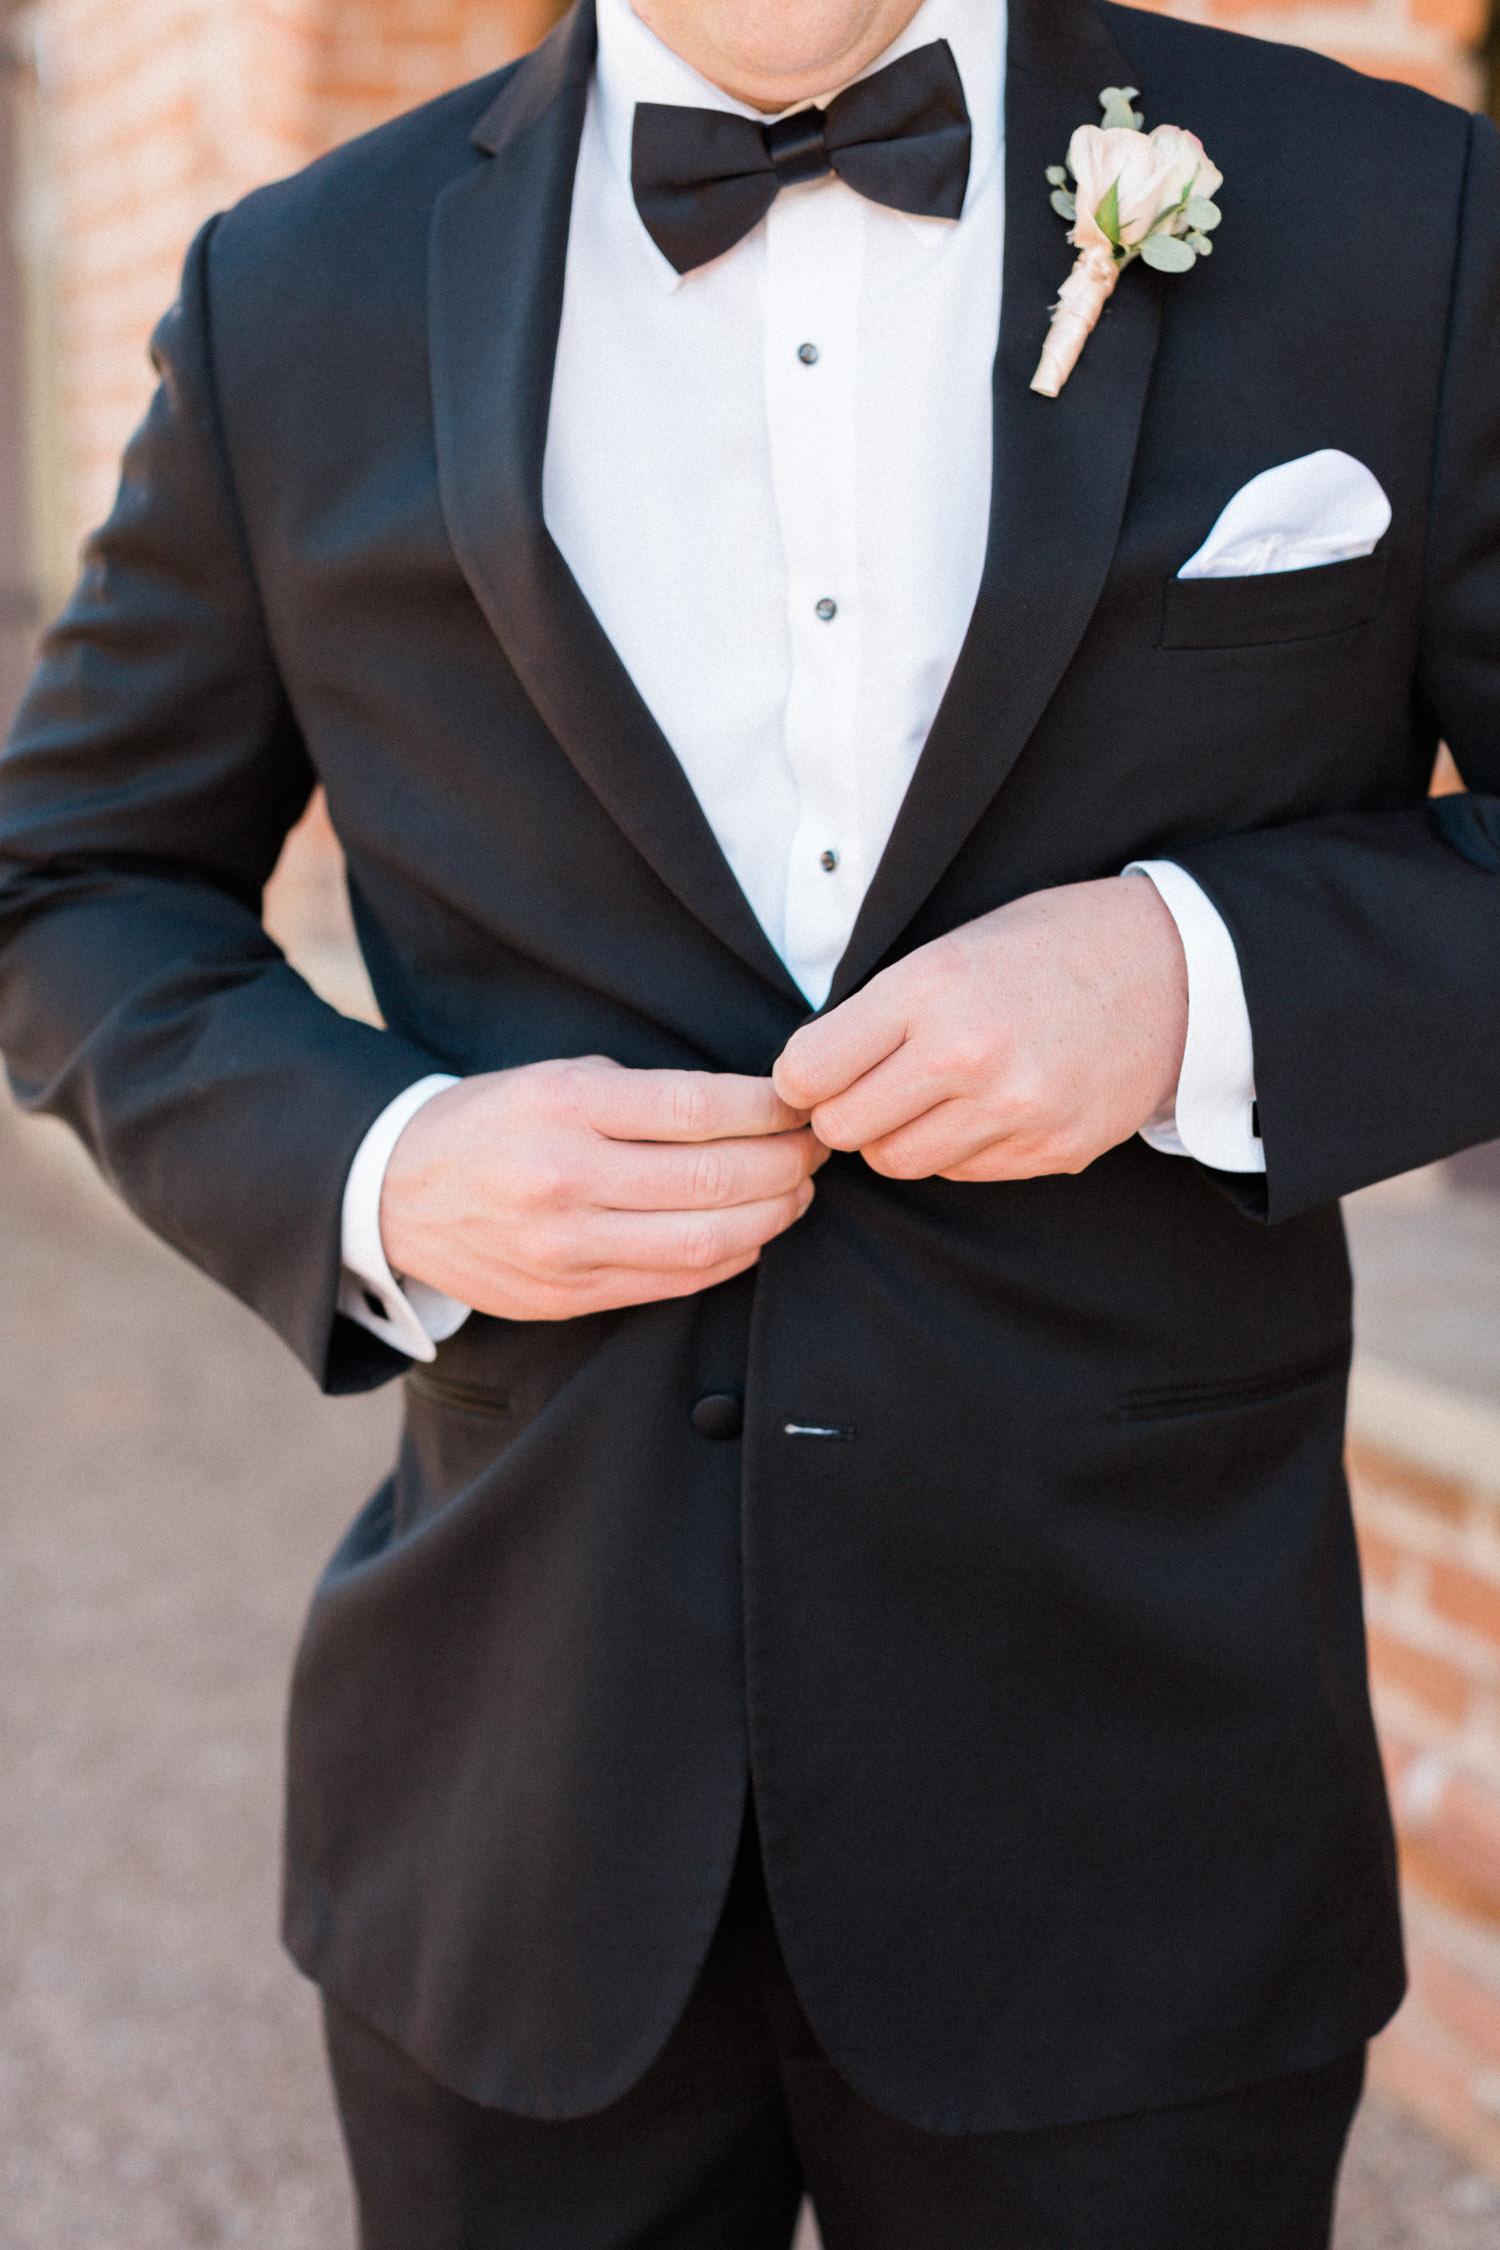 Groom buttoning up black tuxedo